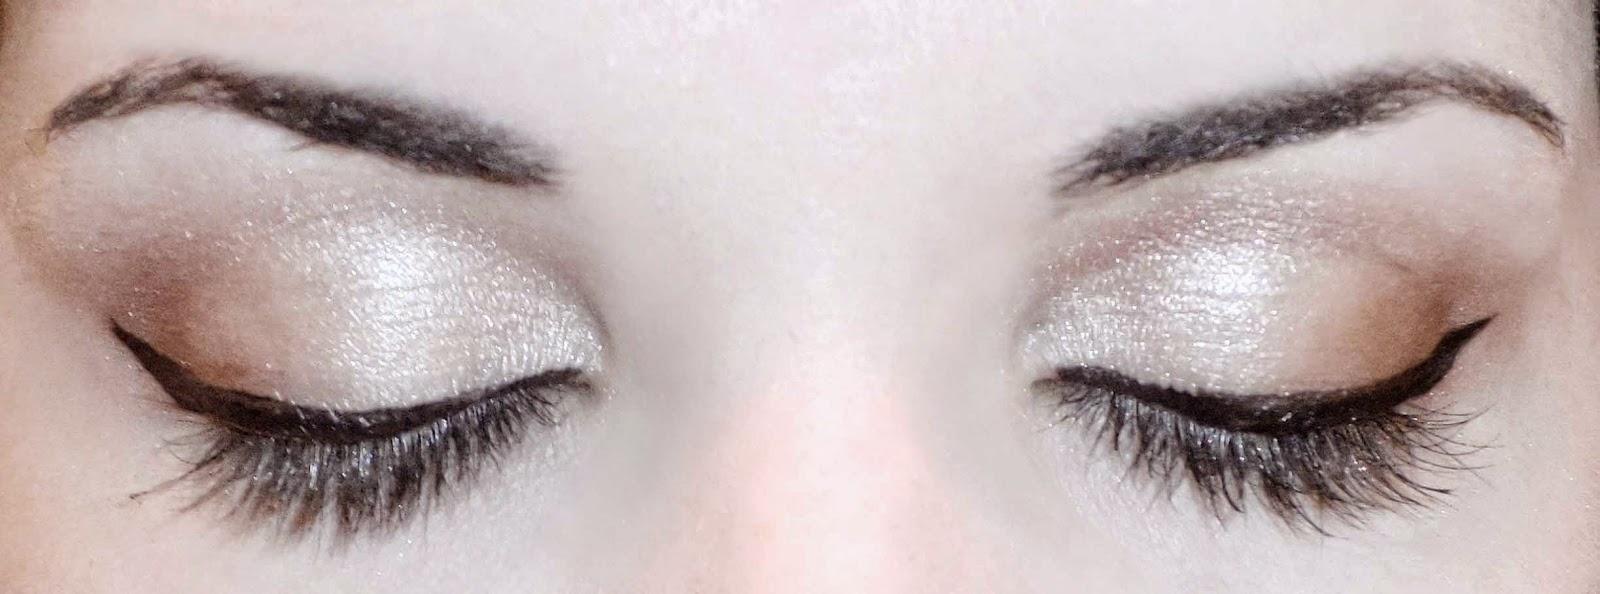 maquillaje pin up eyeliner delineado